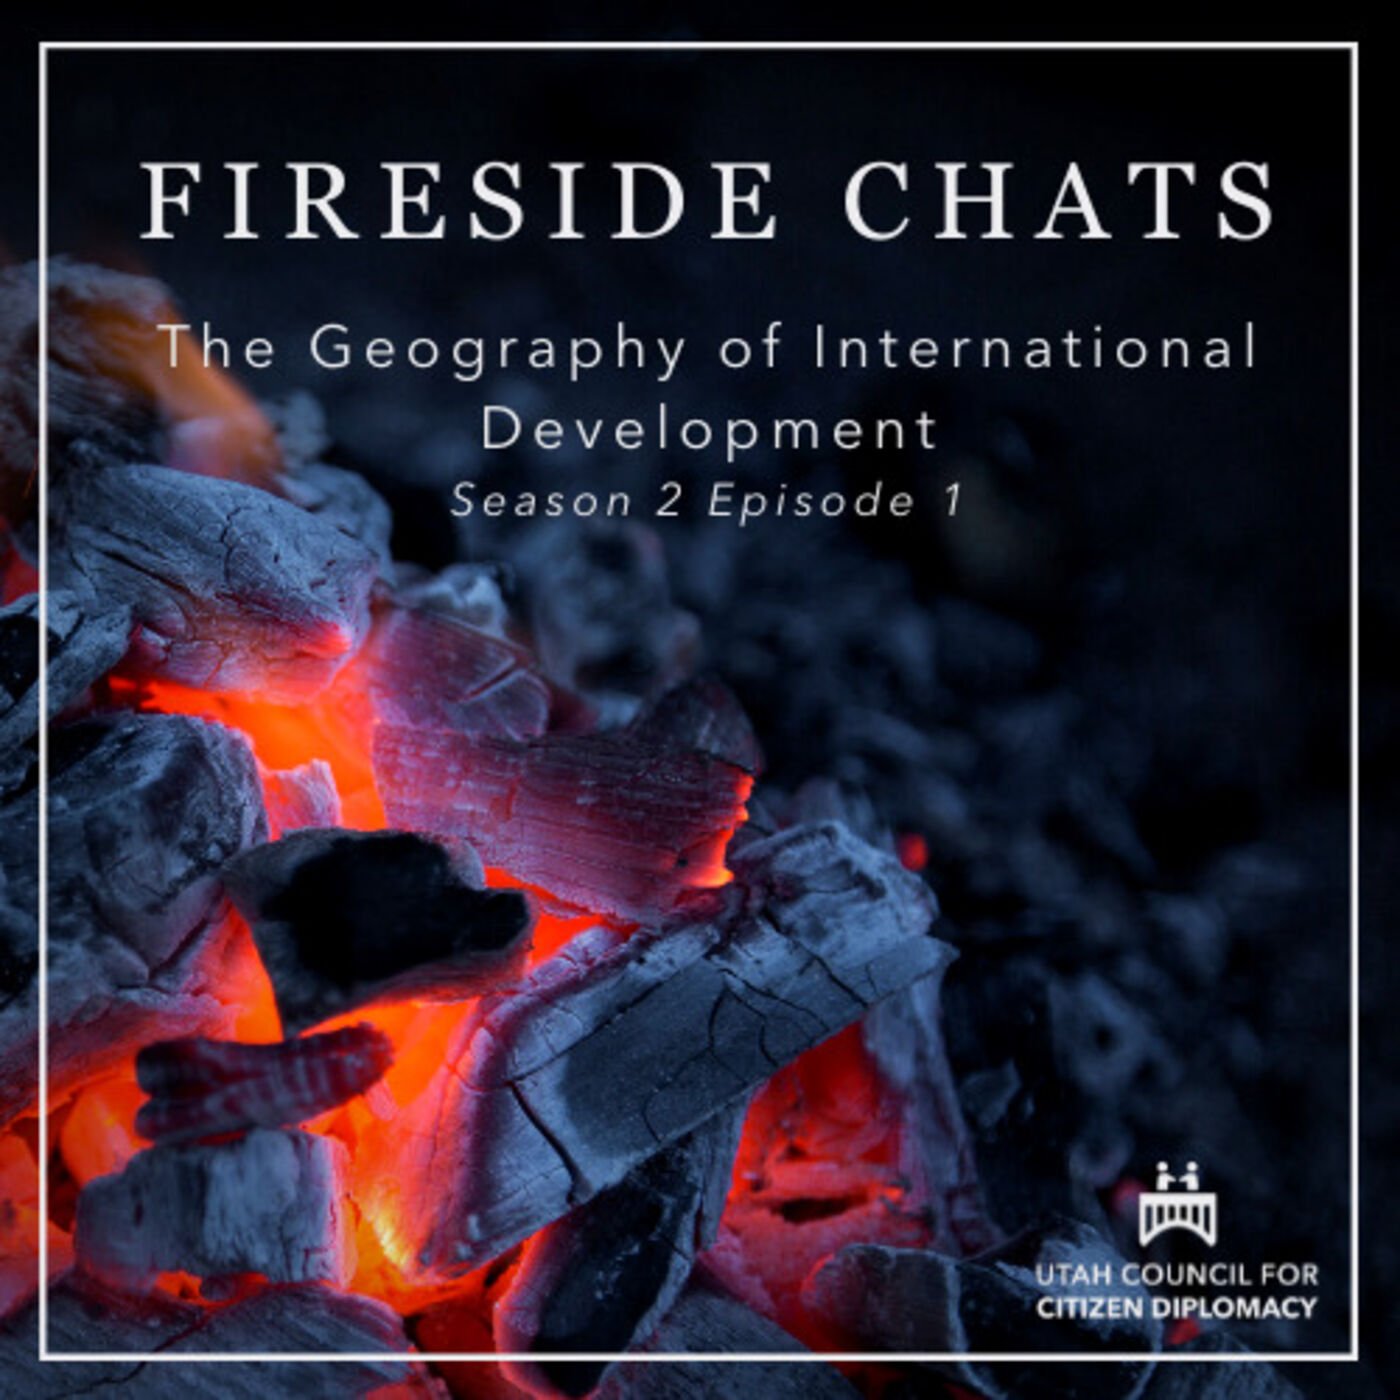 The Geography of International Development